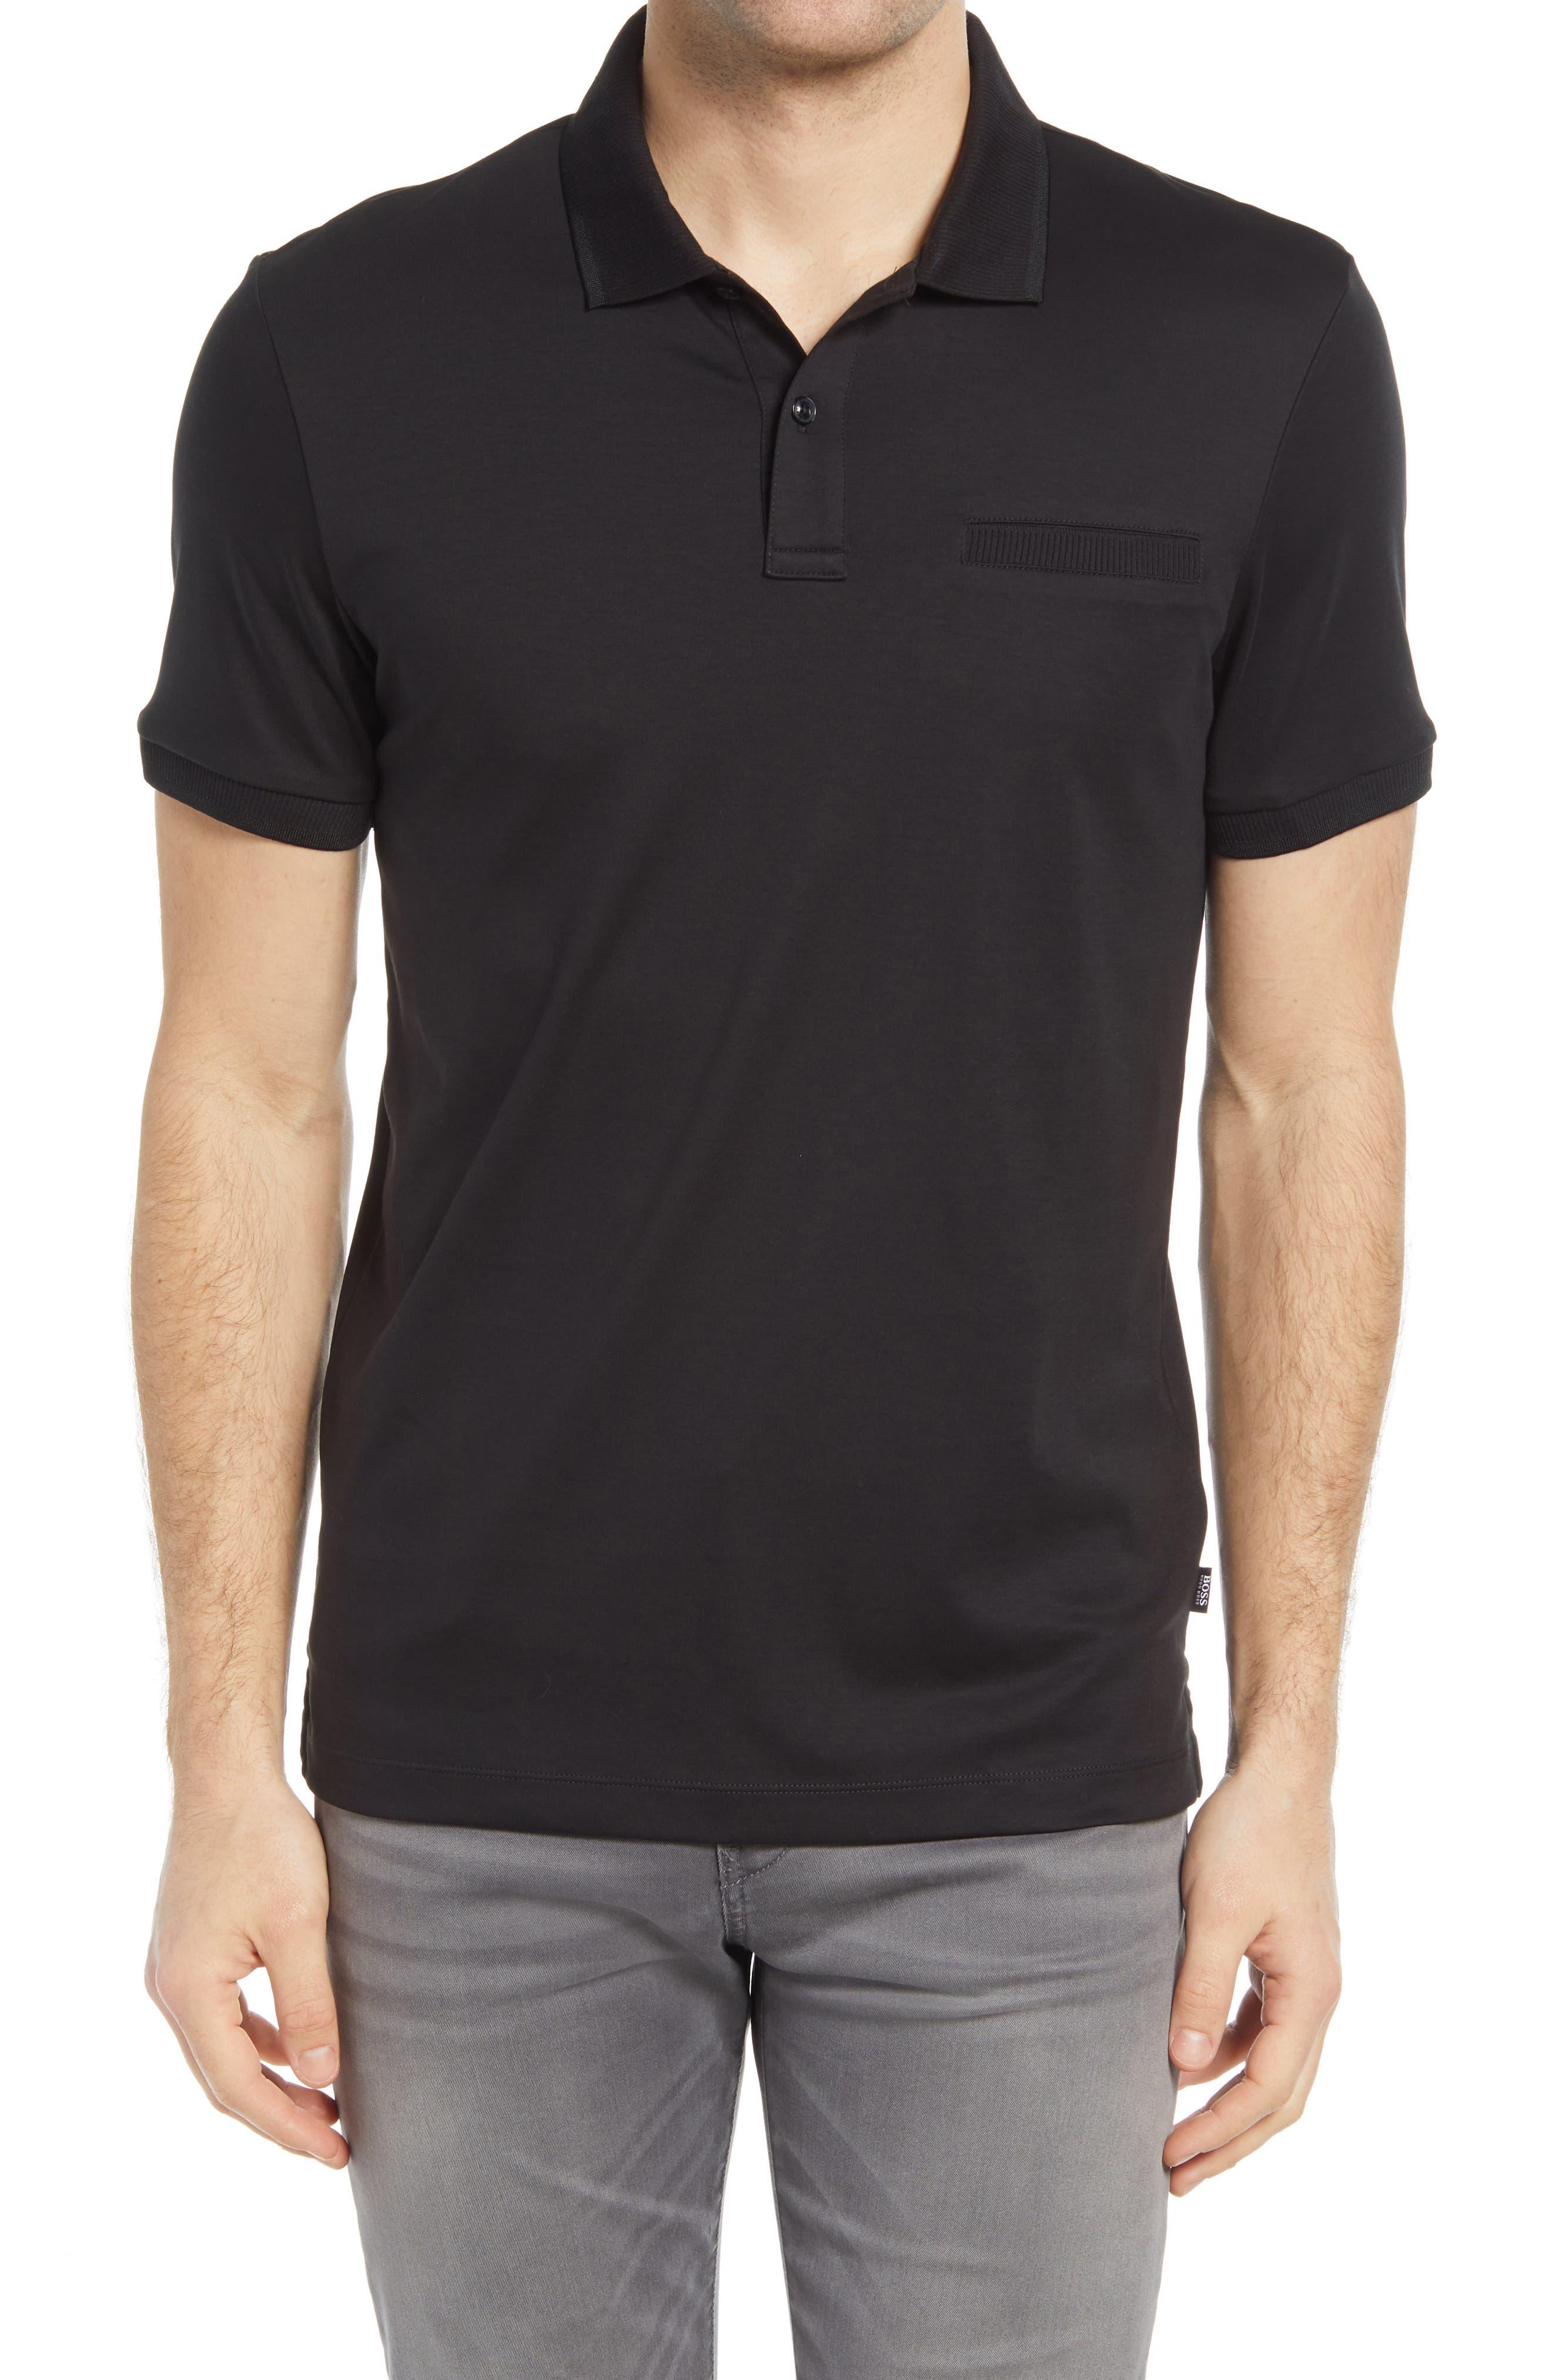 Men's BOSS Polo Shirts | Nordstrom